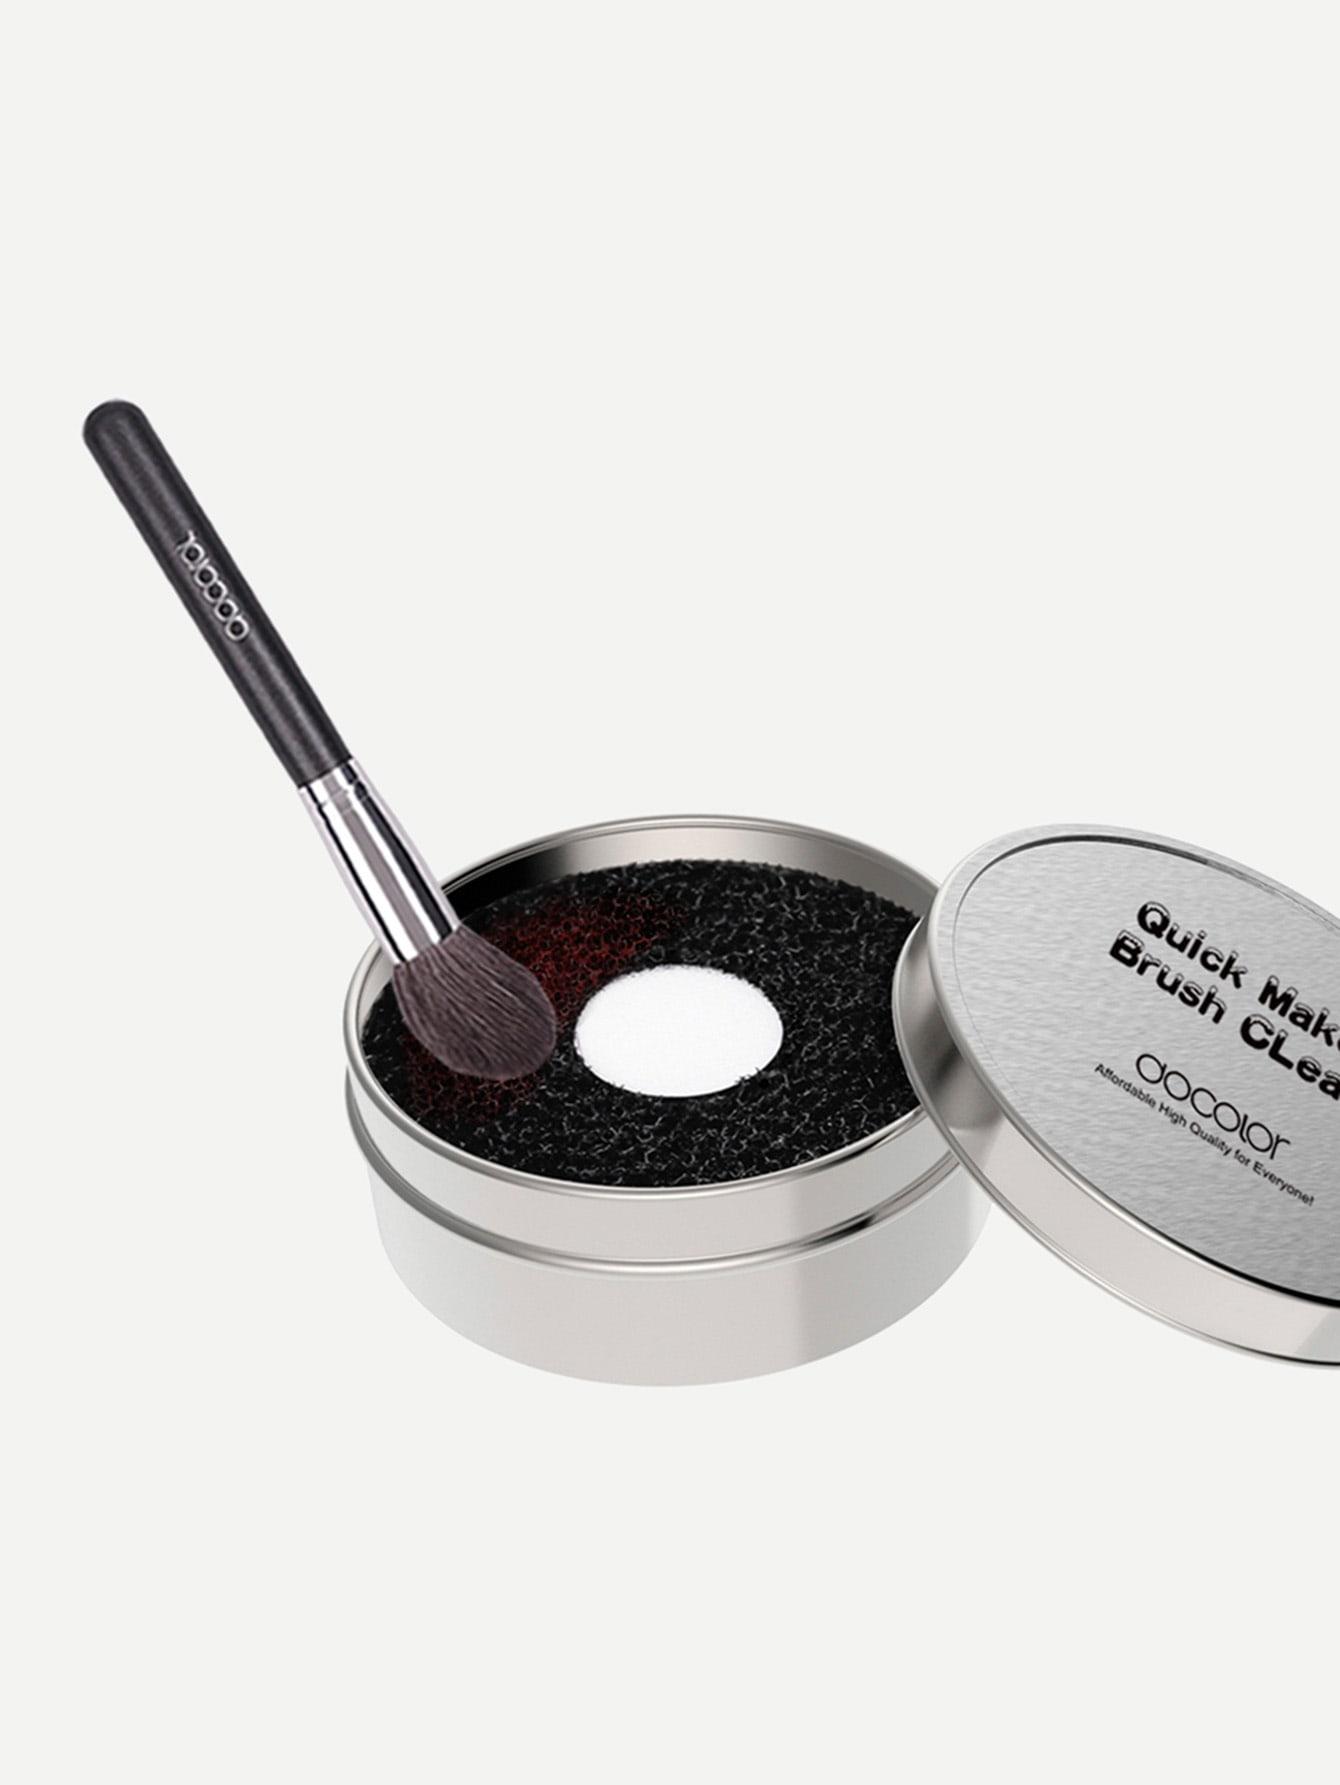 Makeup Brush Sponge Scrub Cleaner Box